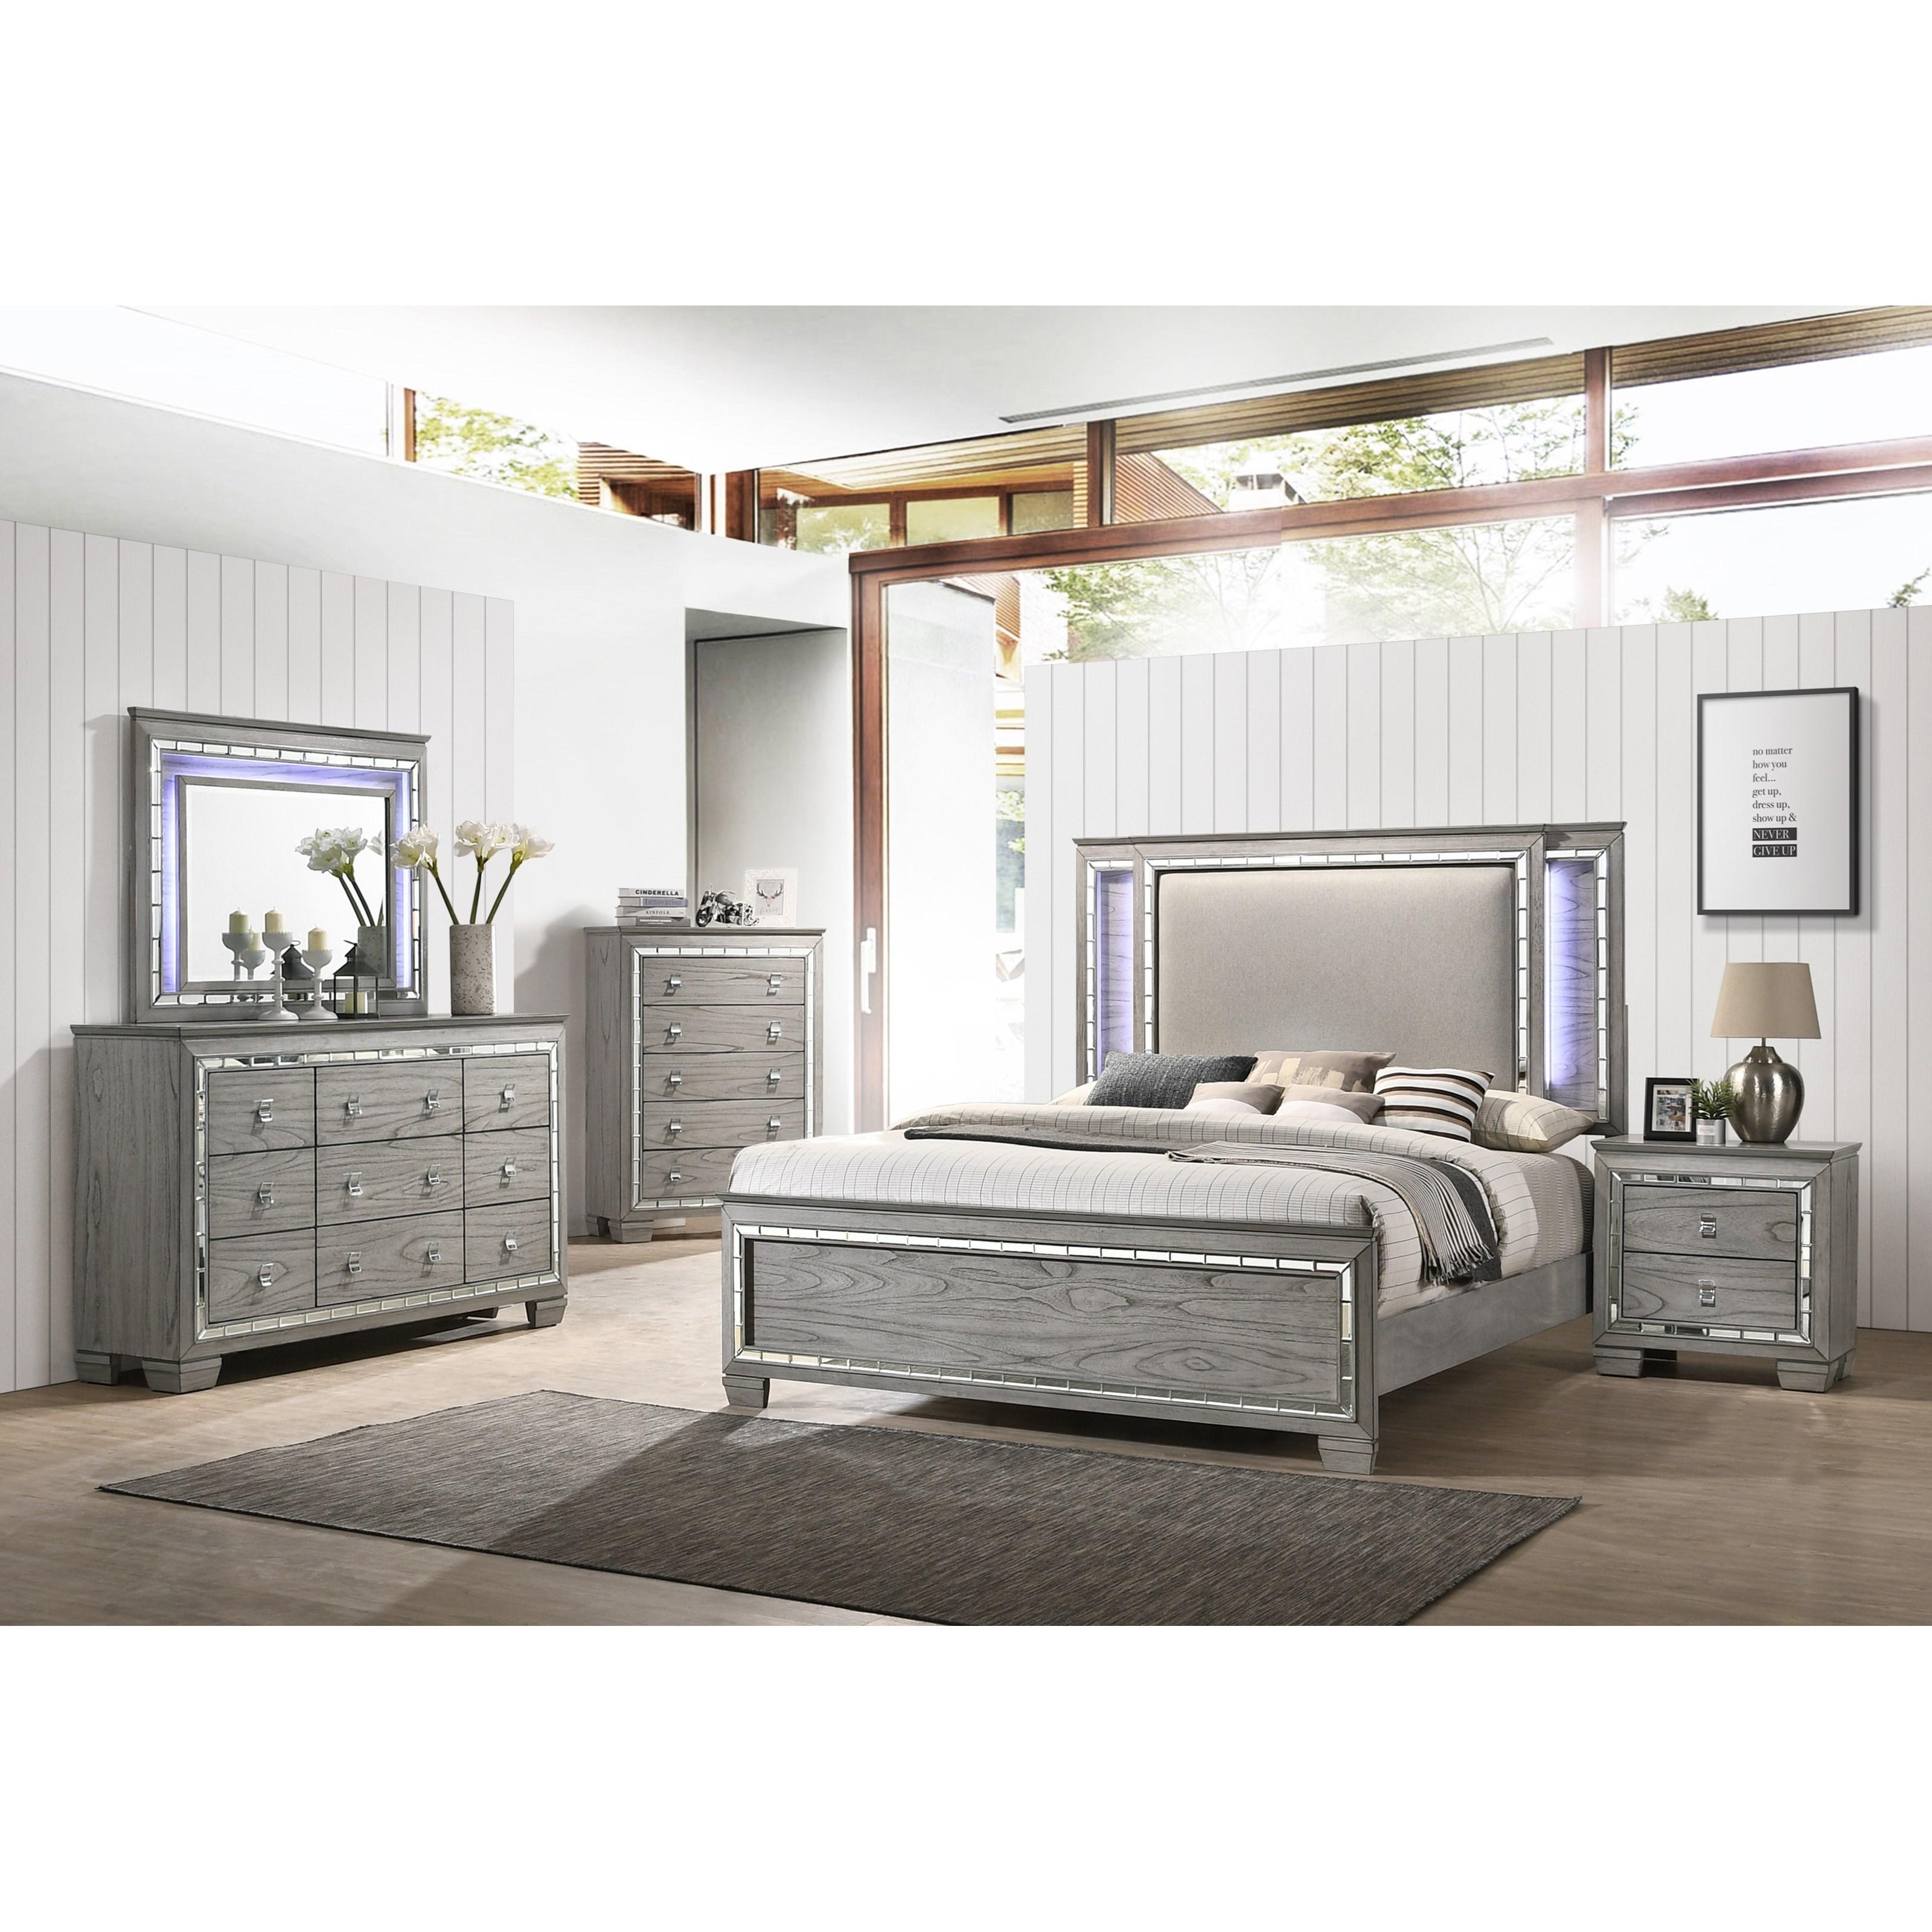 Antares King Bedroom Group by Acme Furniture at Carolina Direct